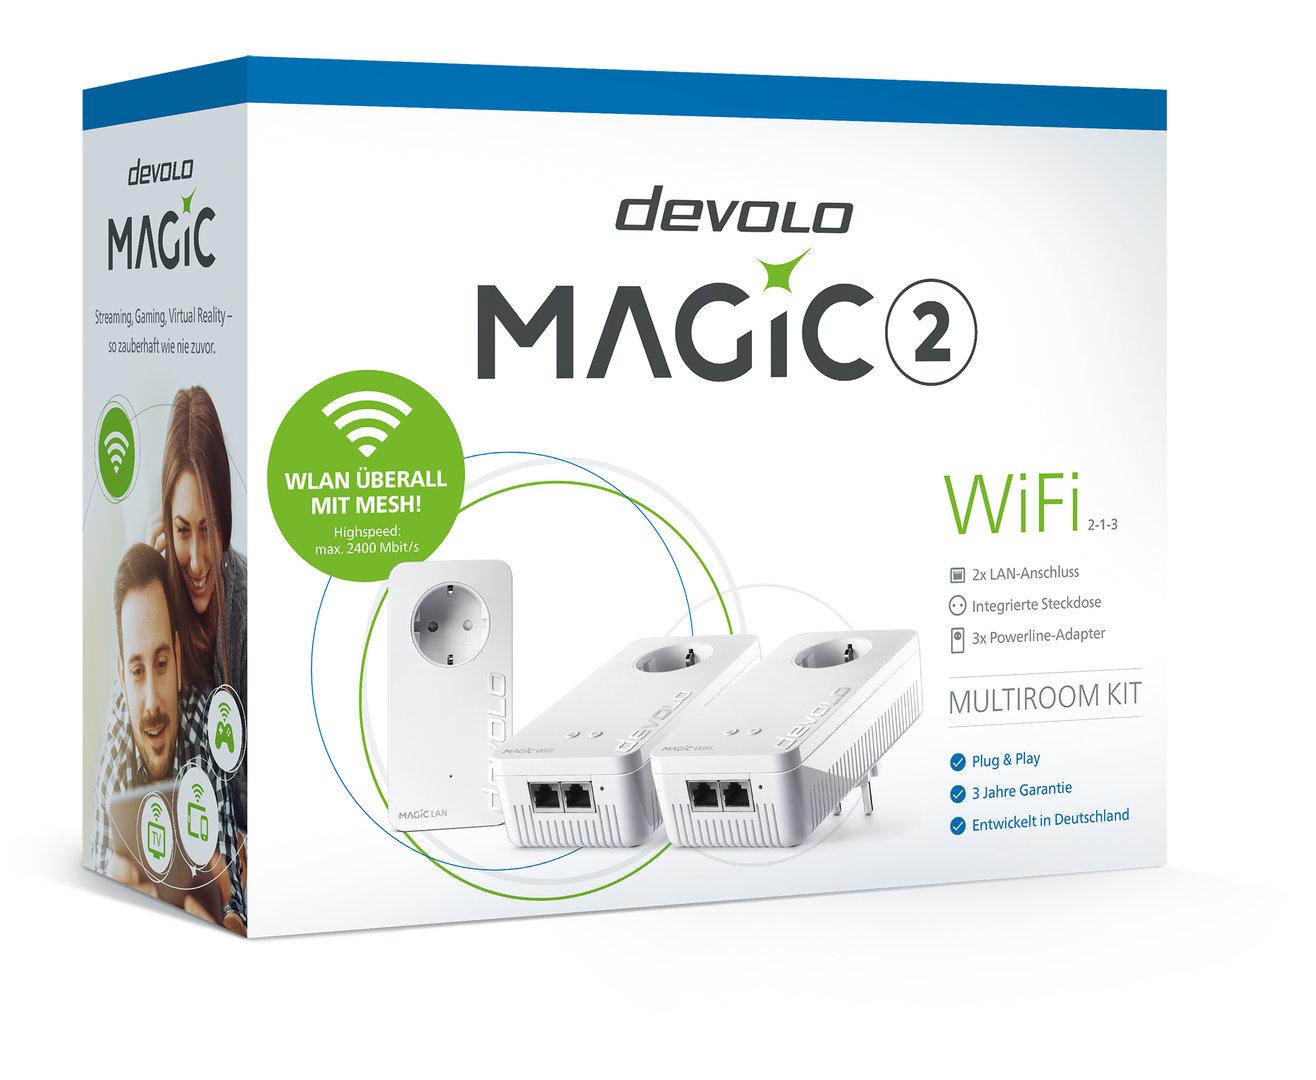 Devolo Magic 2 WiFi Multiroom-Kit